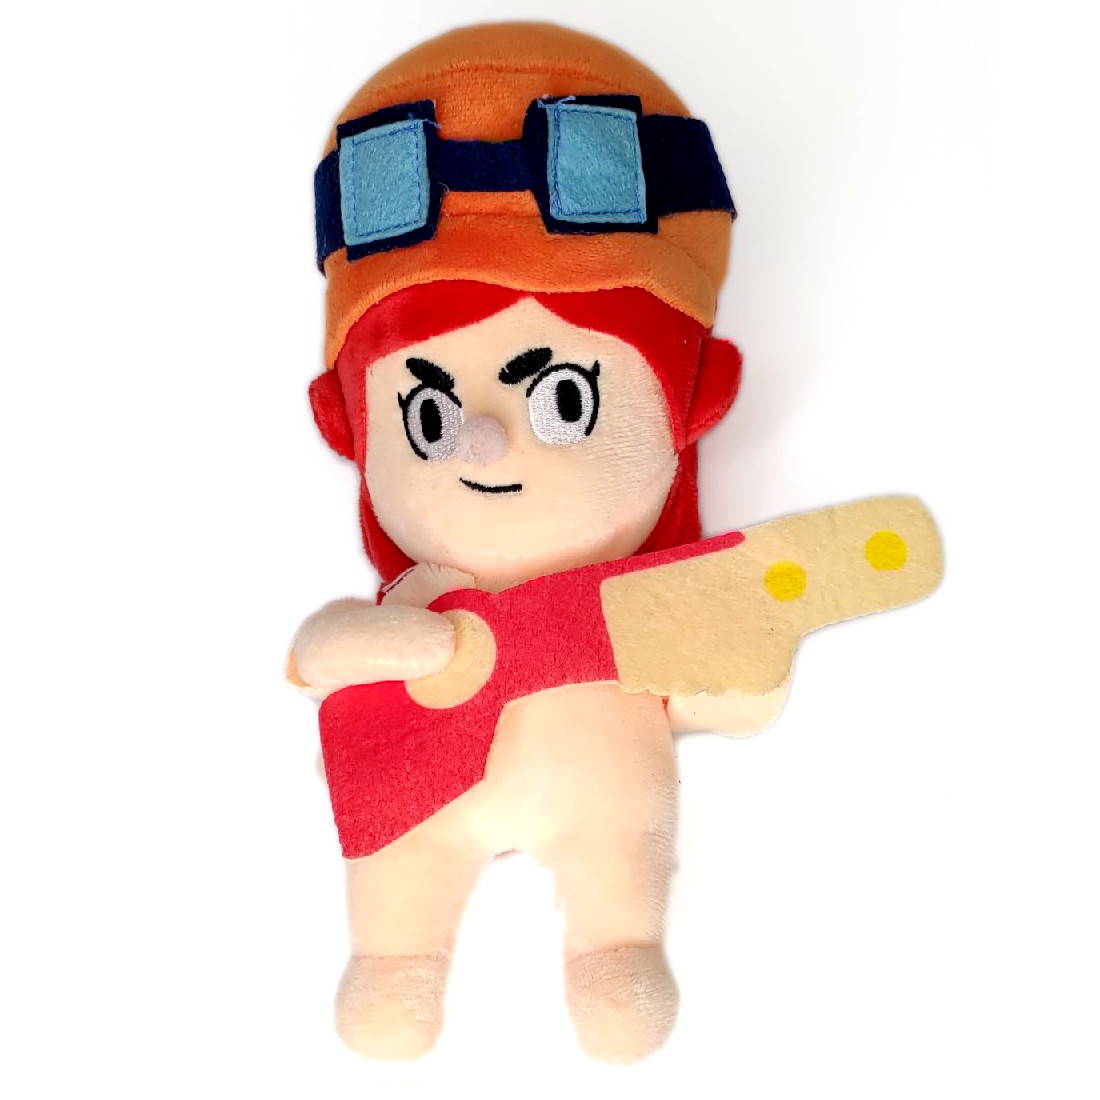 Плюшевая игрушка Джесси из игры Brawl Stars (Броул Старс)